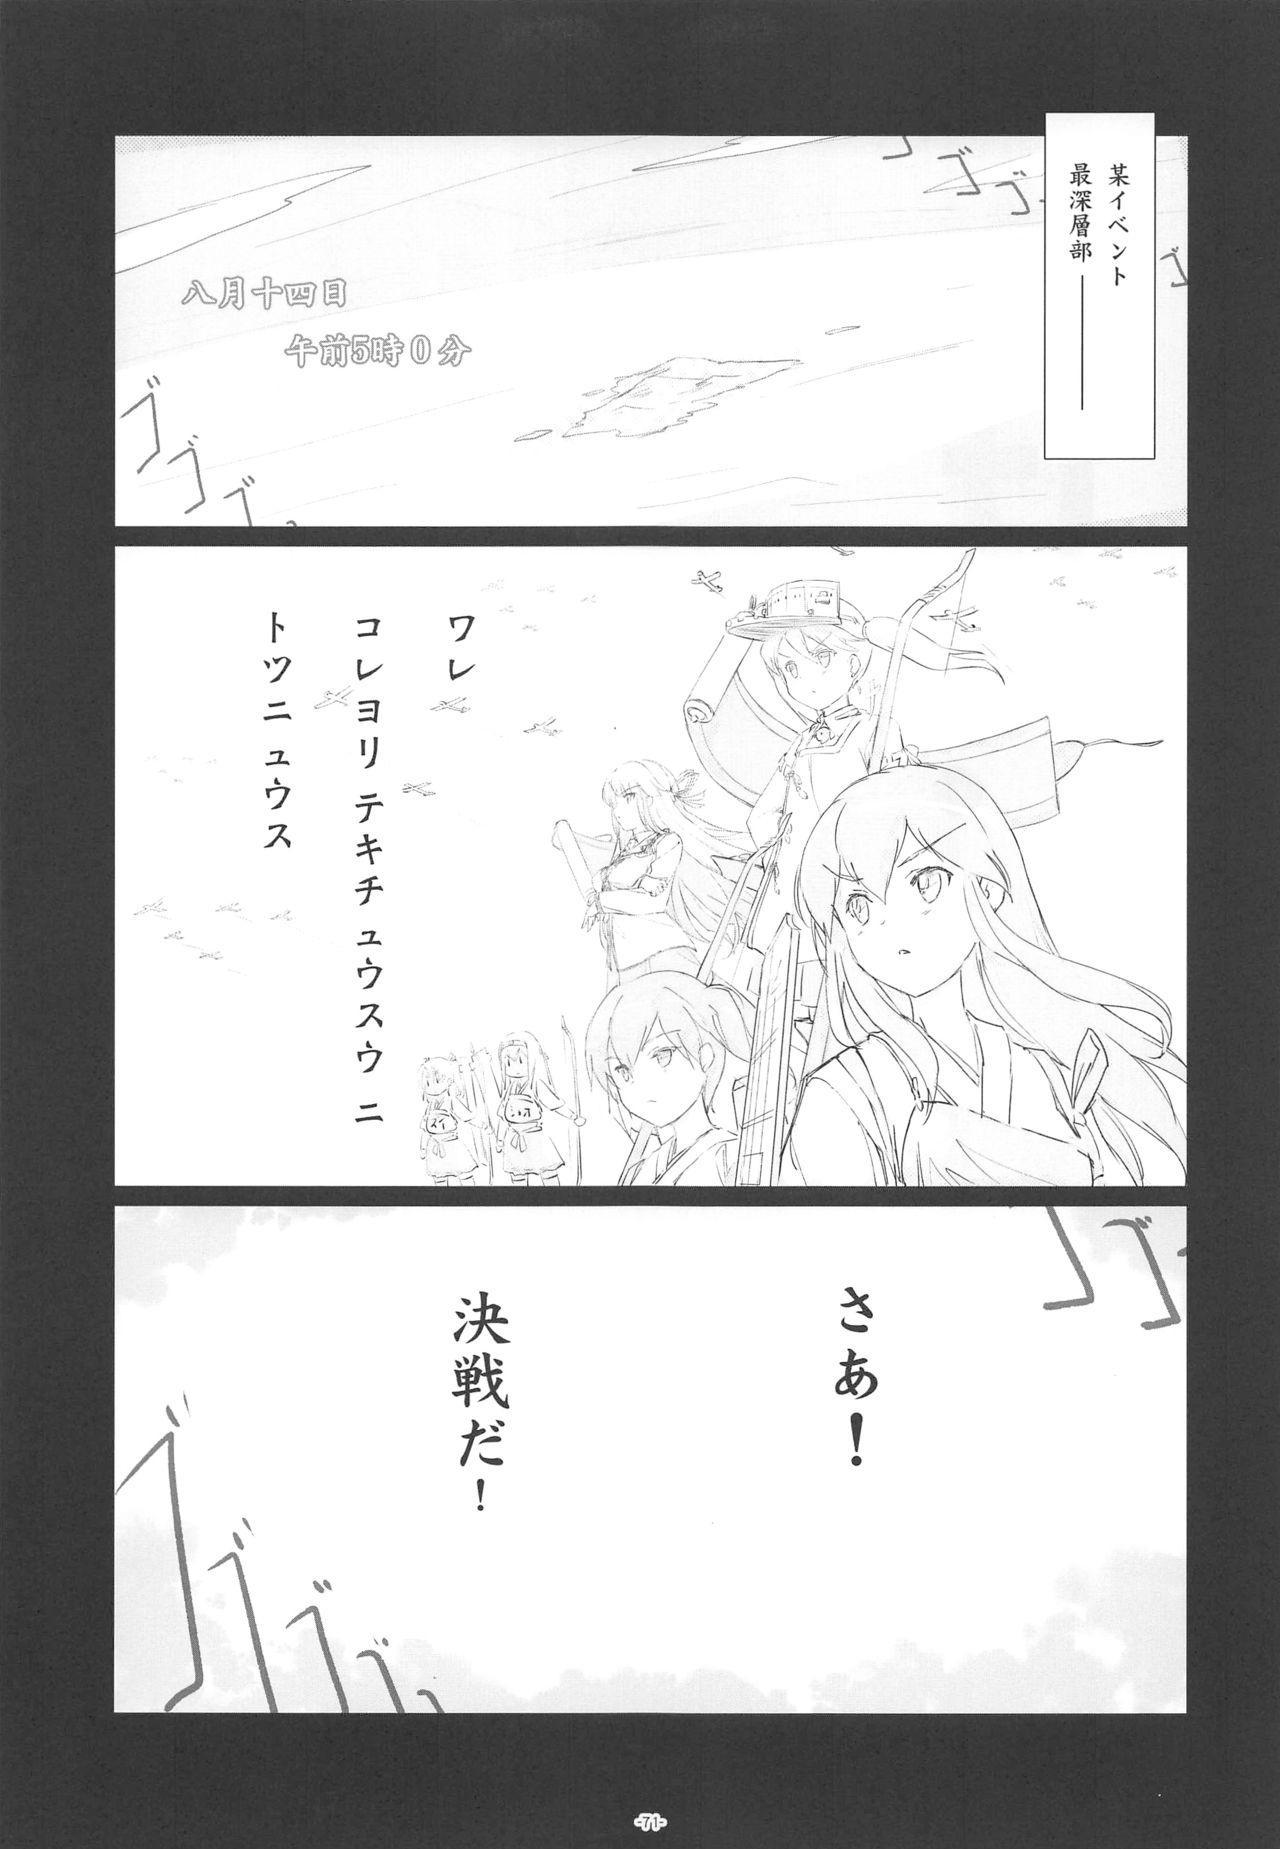 Korokoro-Manman II Korokoro:P Soushuuhen II 69